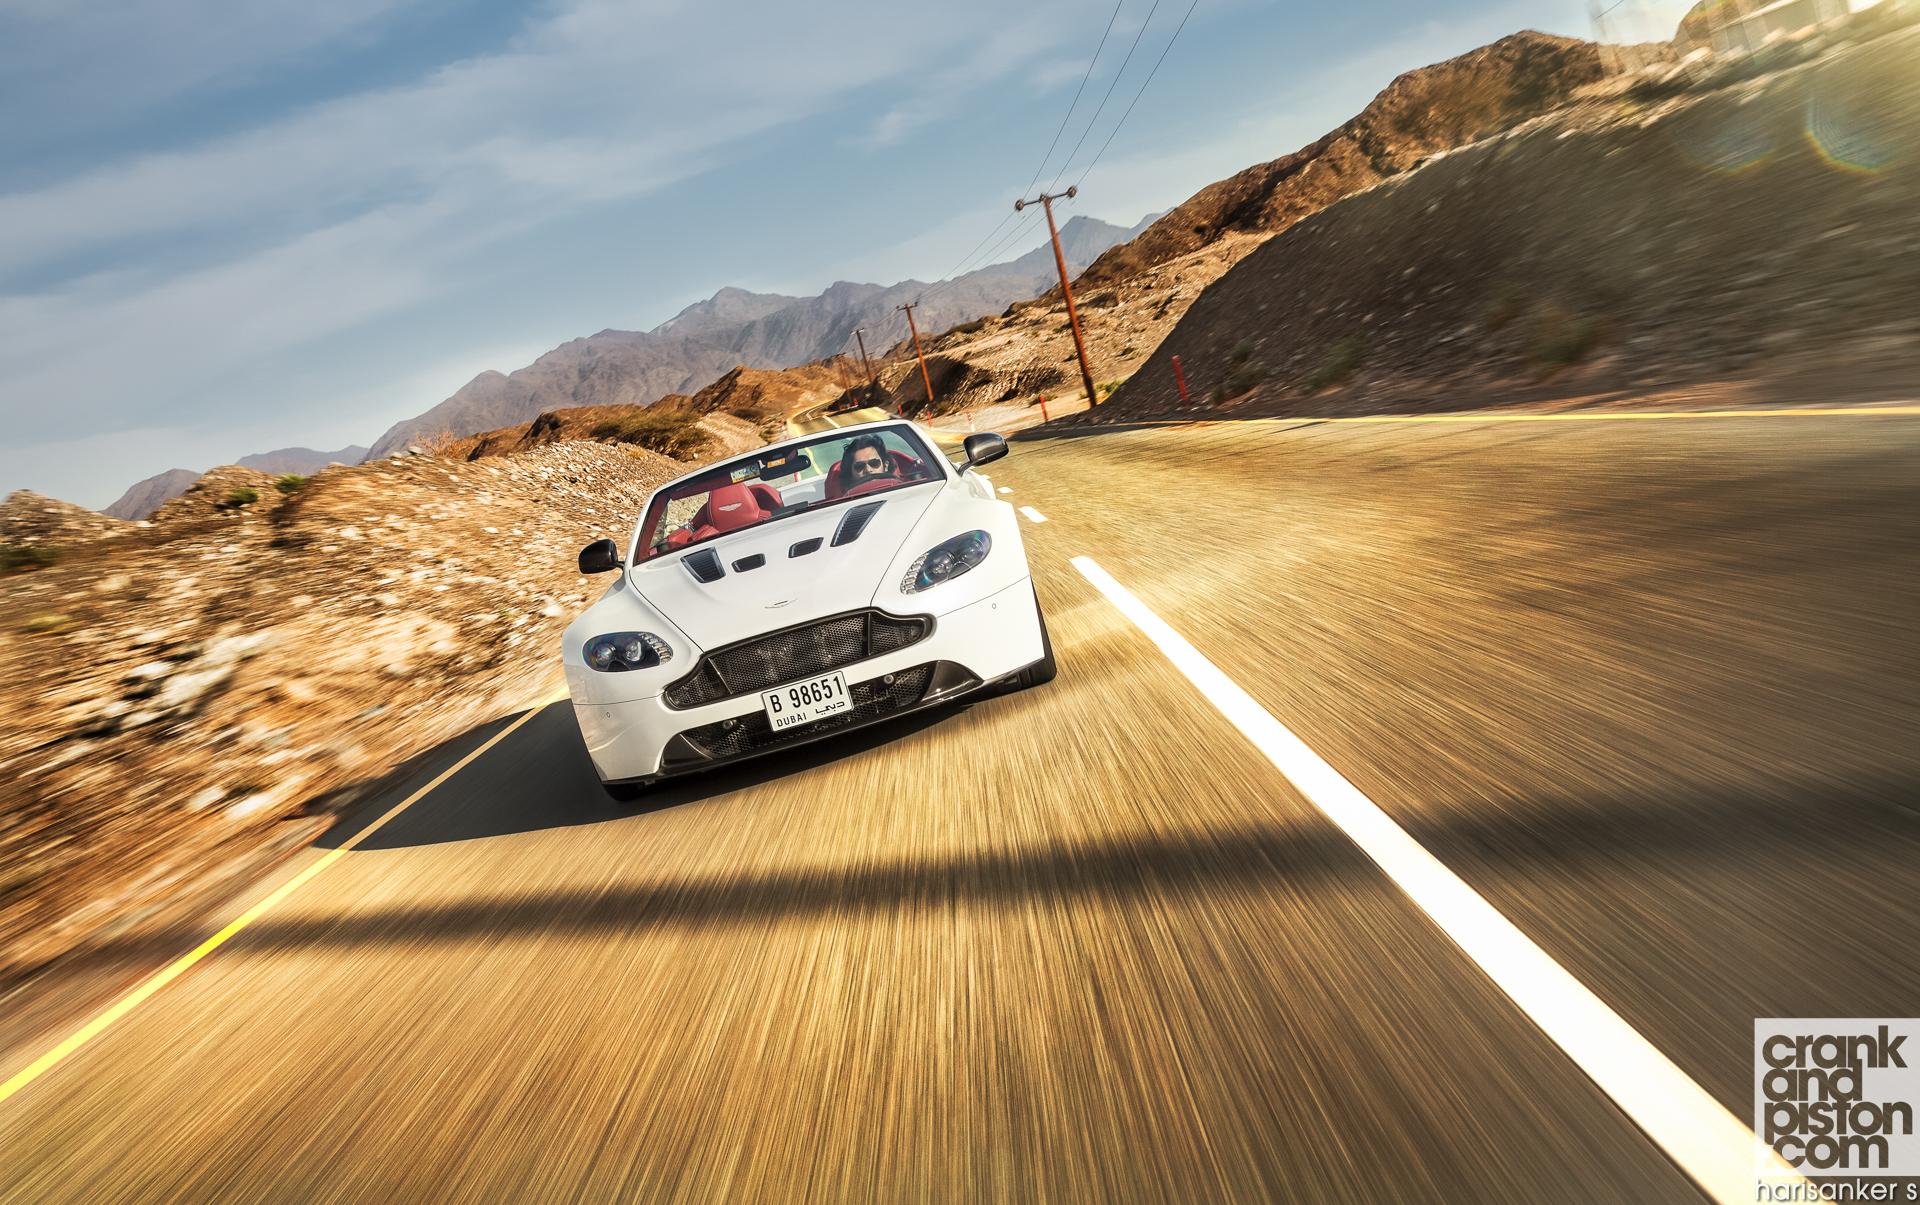 Aston Martin V12 Vantage S Roadster crankandpiston Wallpapers-3